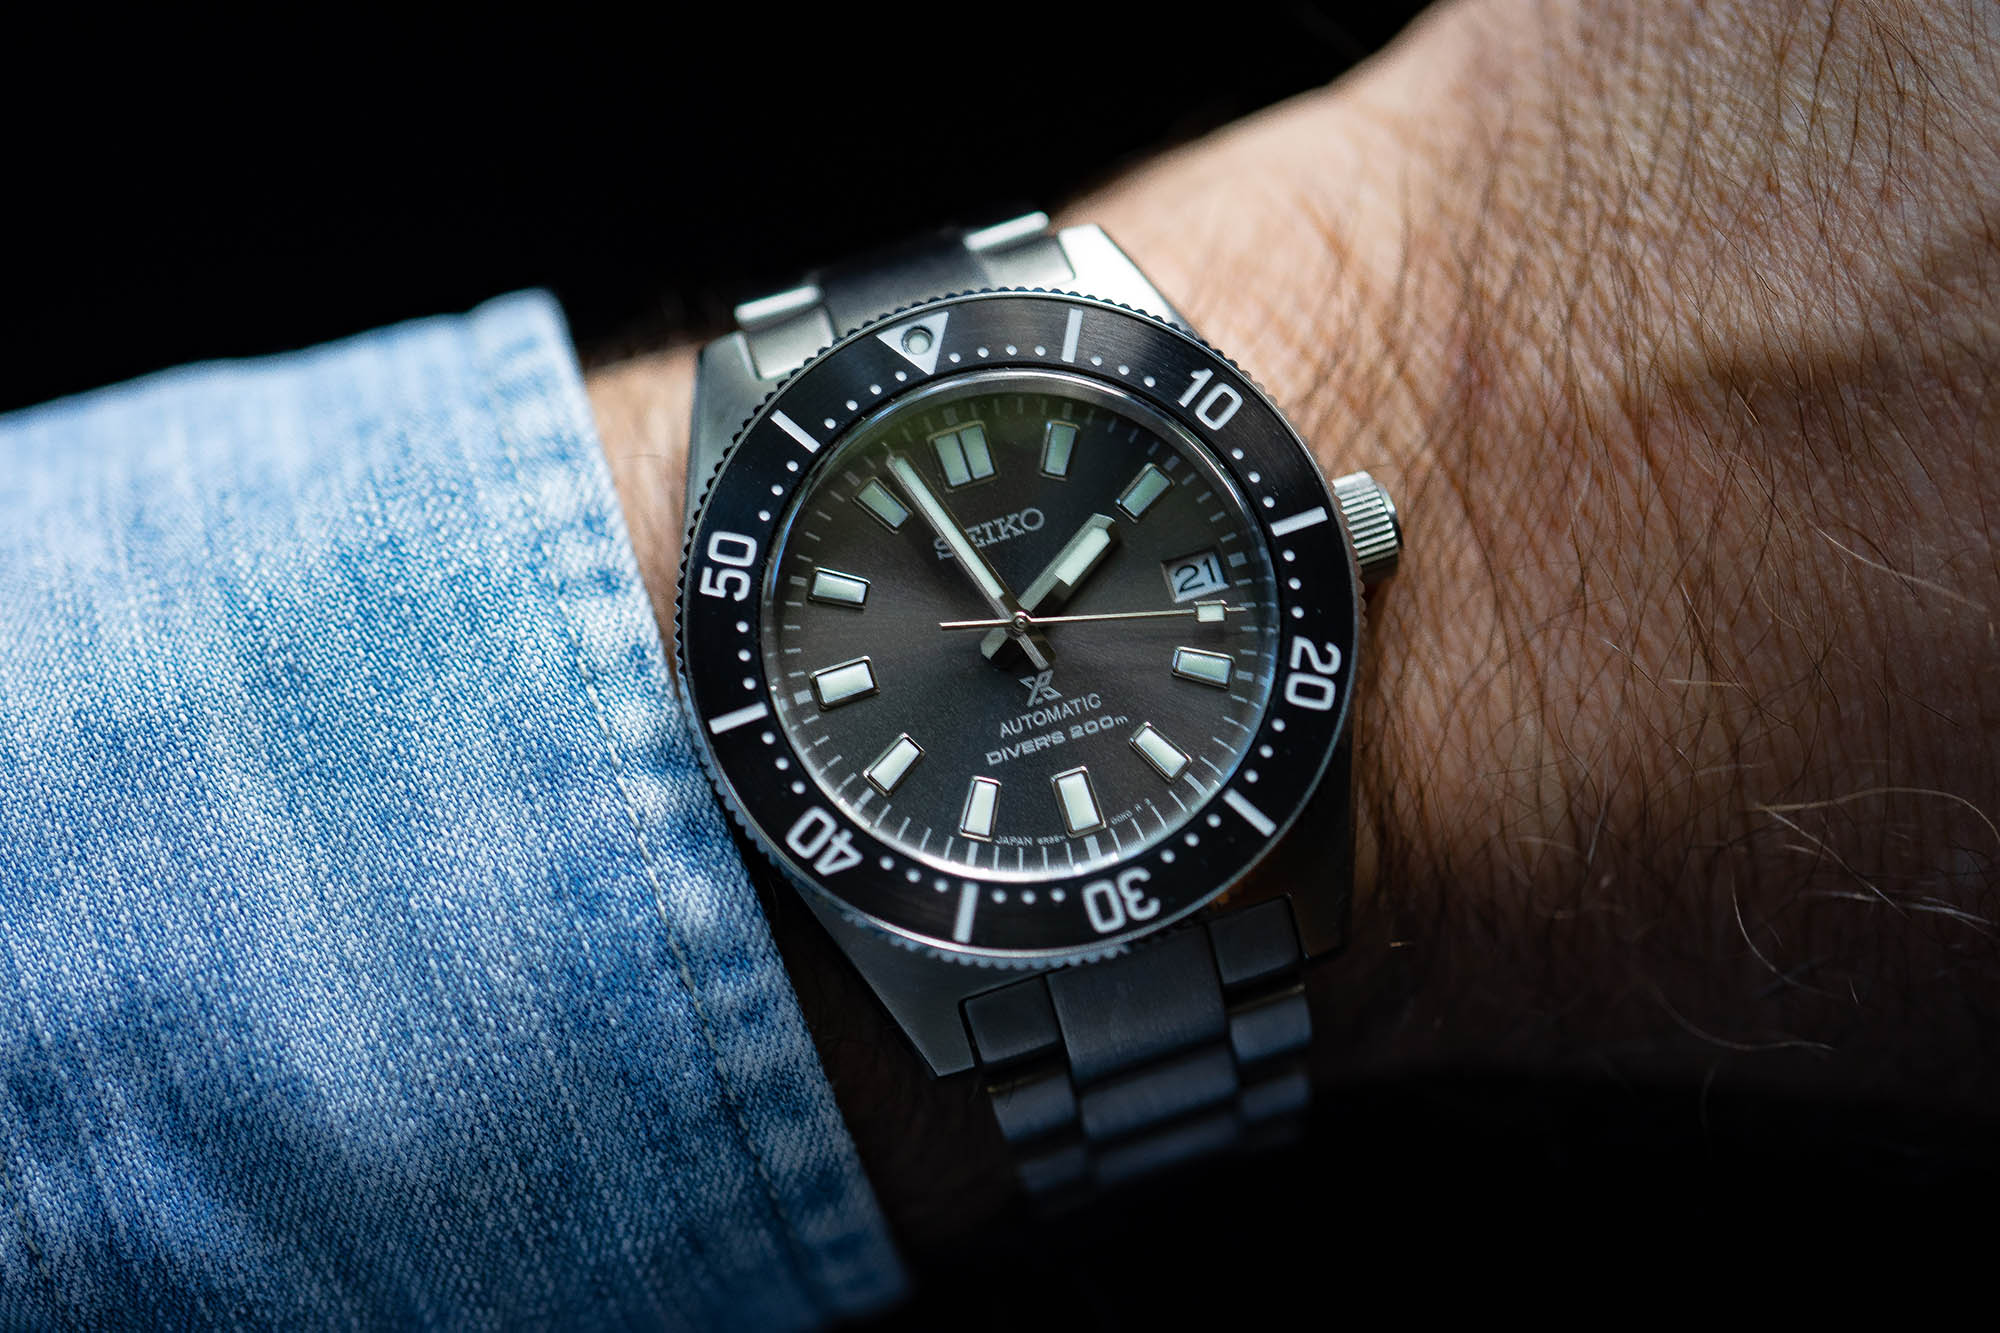 Hands-On Review – Seiko SPB143 / SBDC101 62MAS Prospex 200m Diver